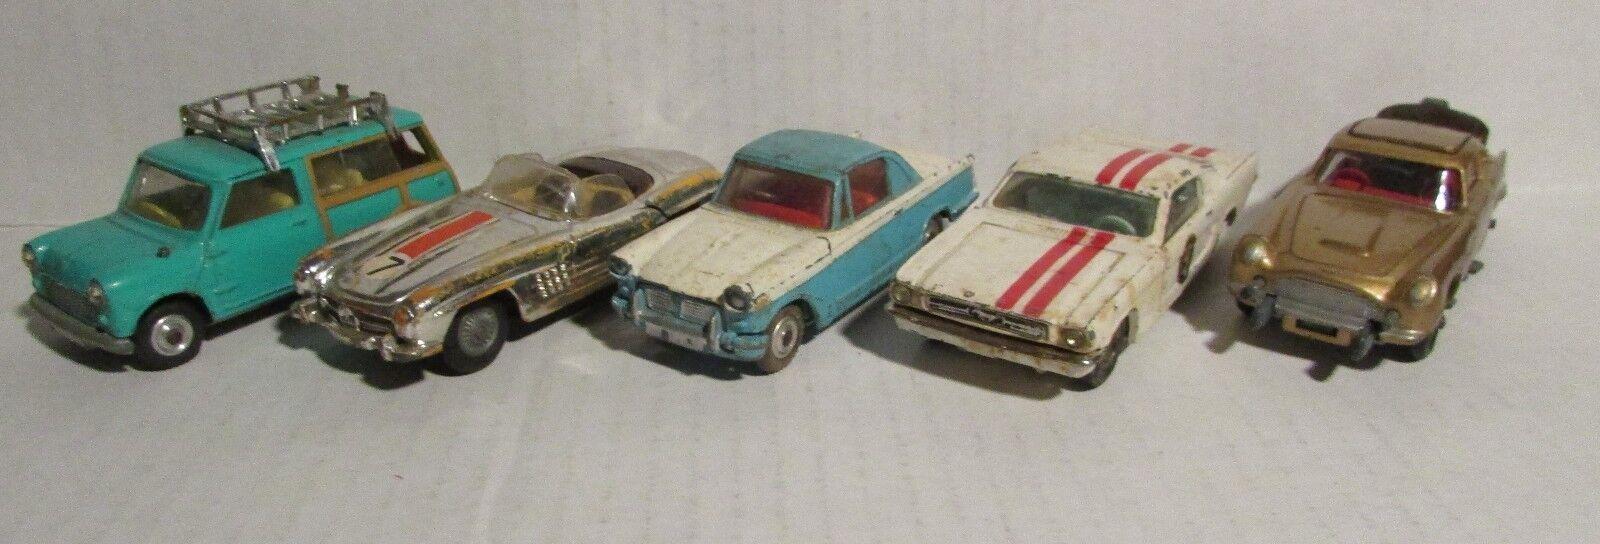 1960 s CORGI Astin Martin Herald COUPÉ 300 SL Mustang 2+2 Austin Mini Countryman